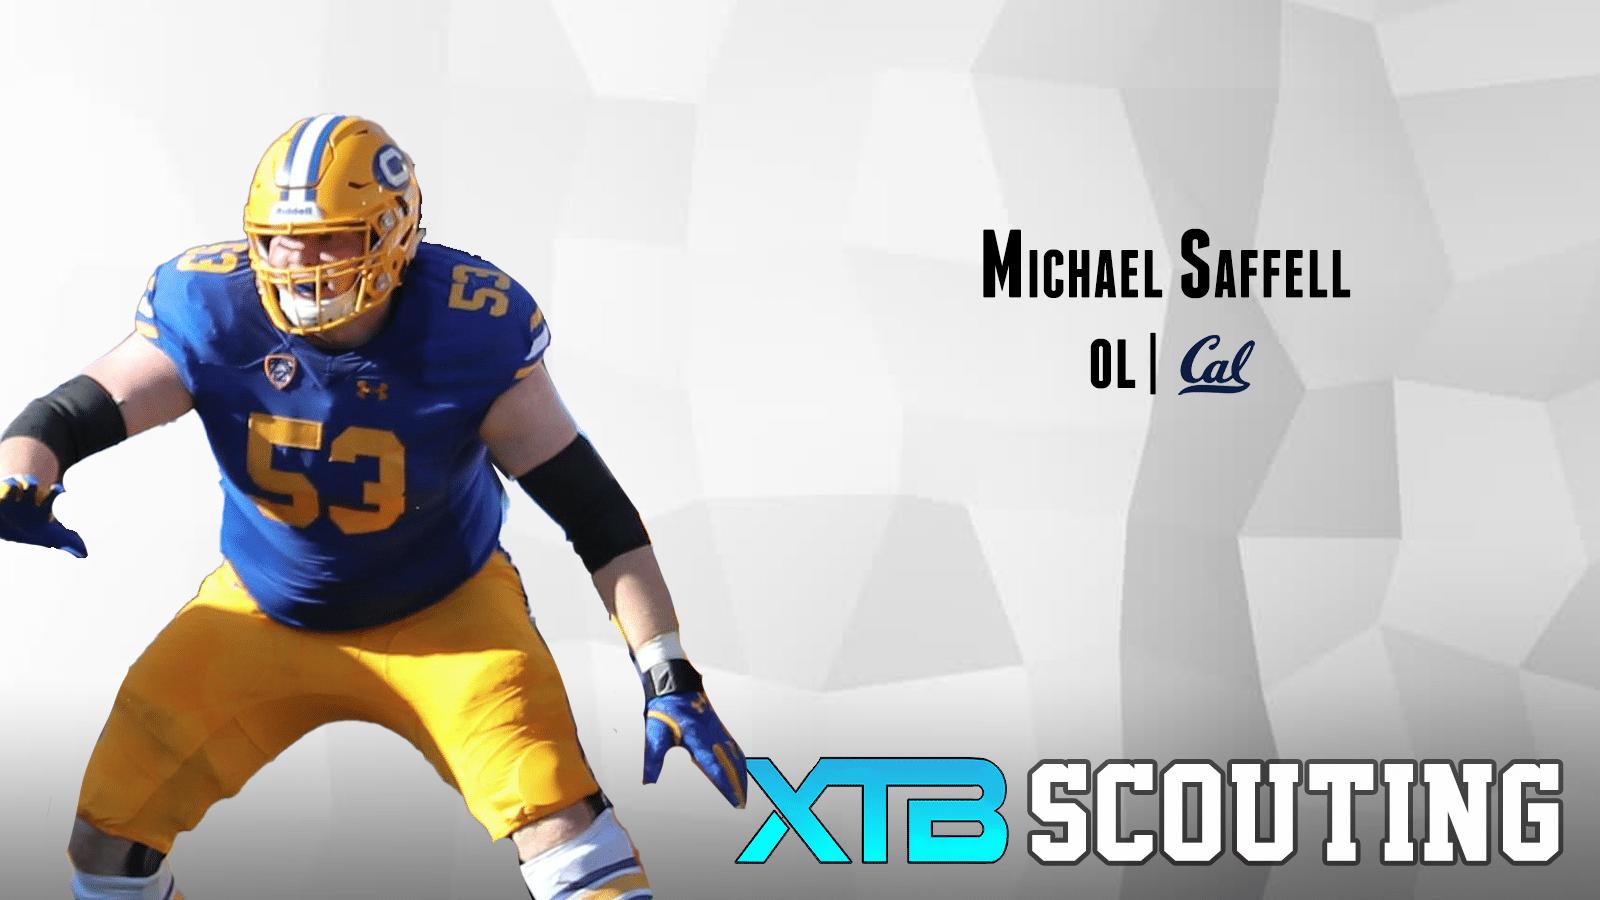 Michael Saffell